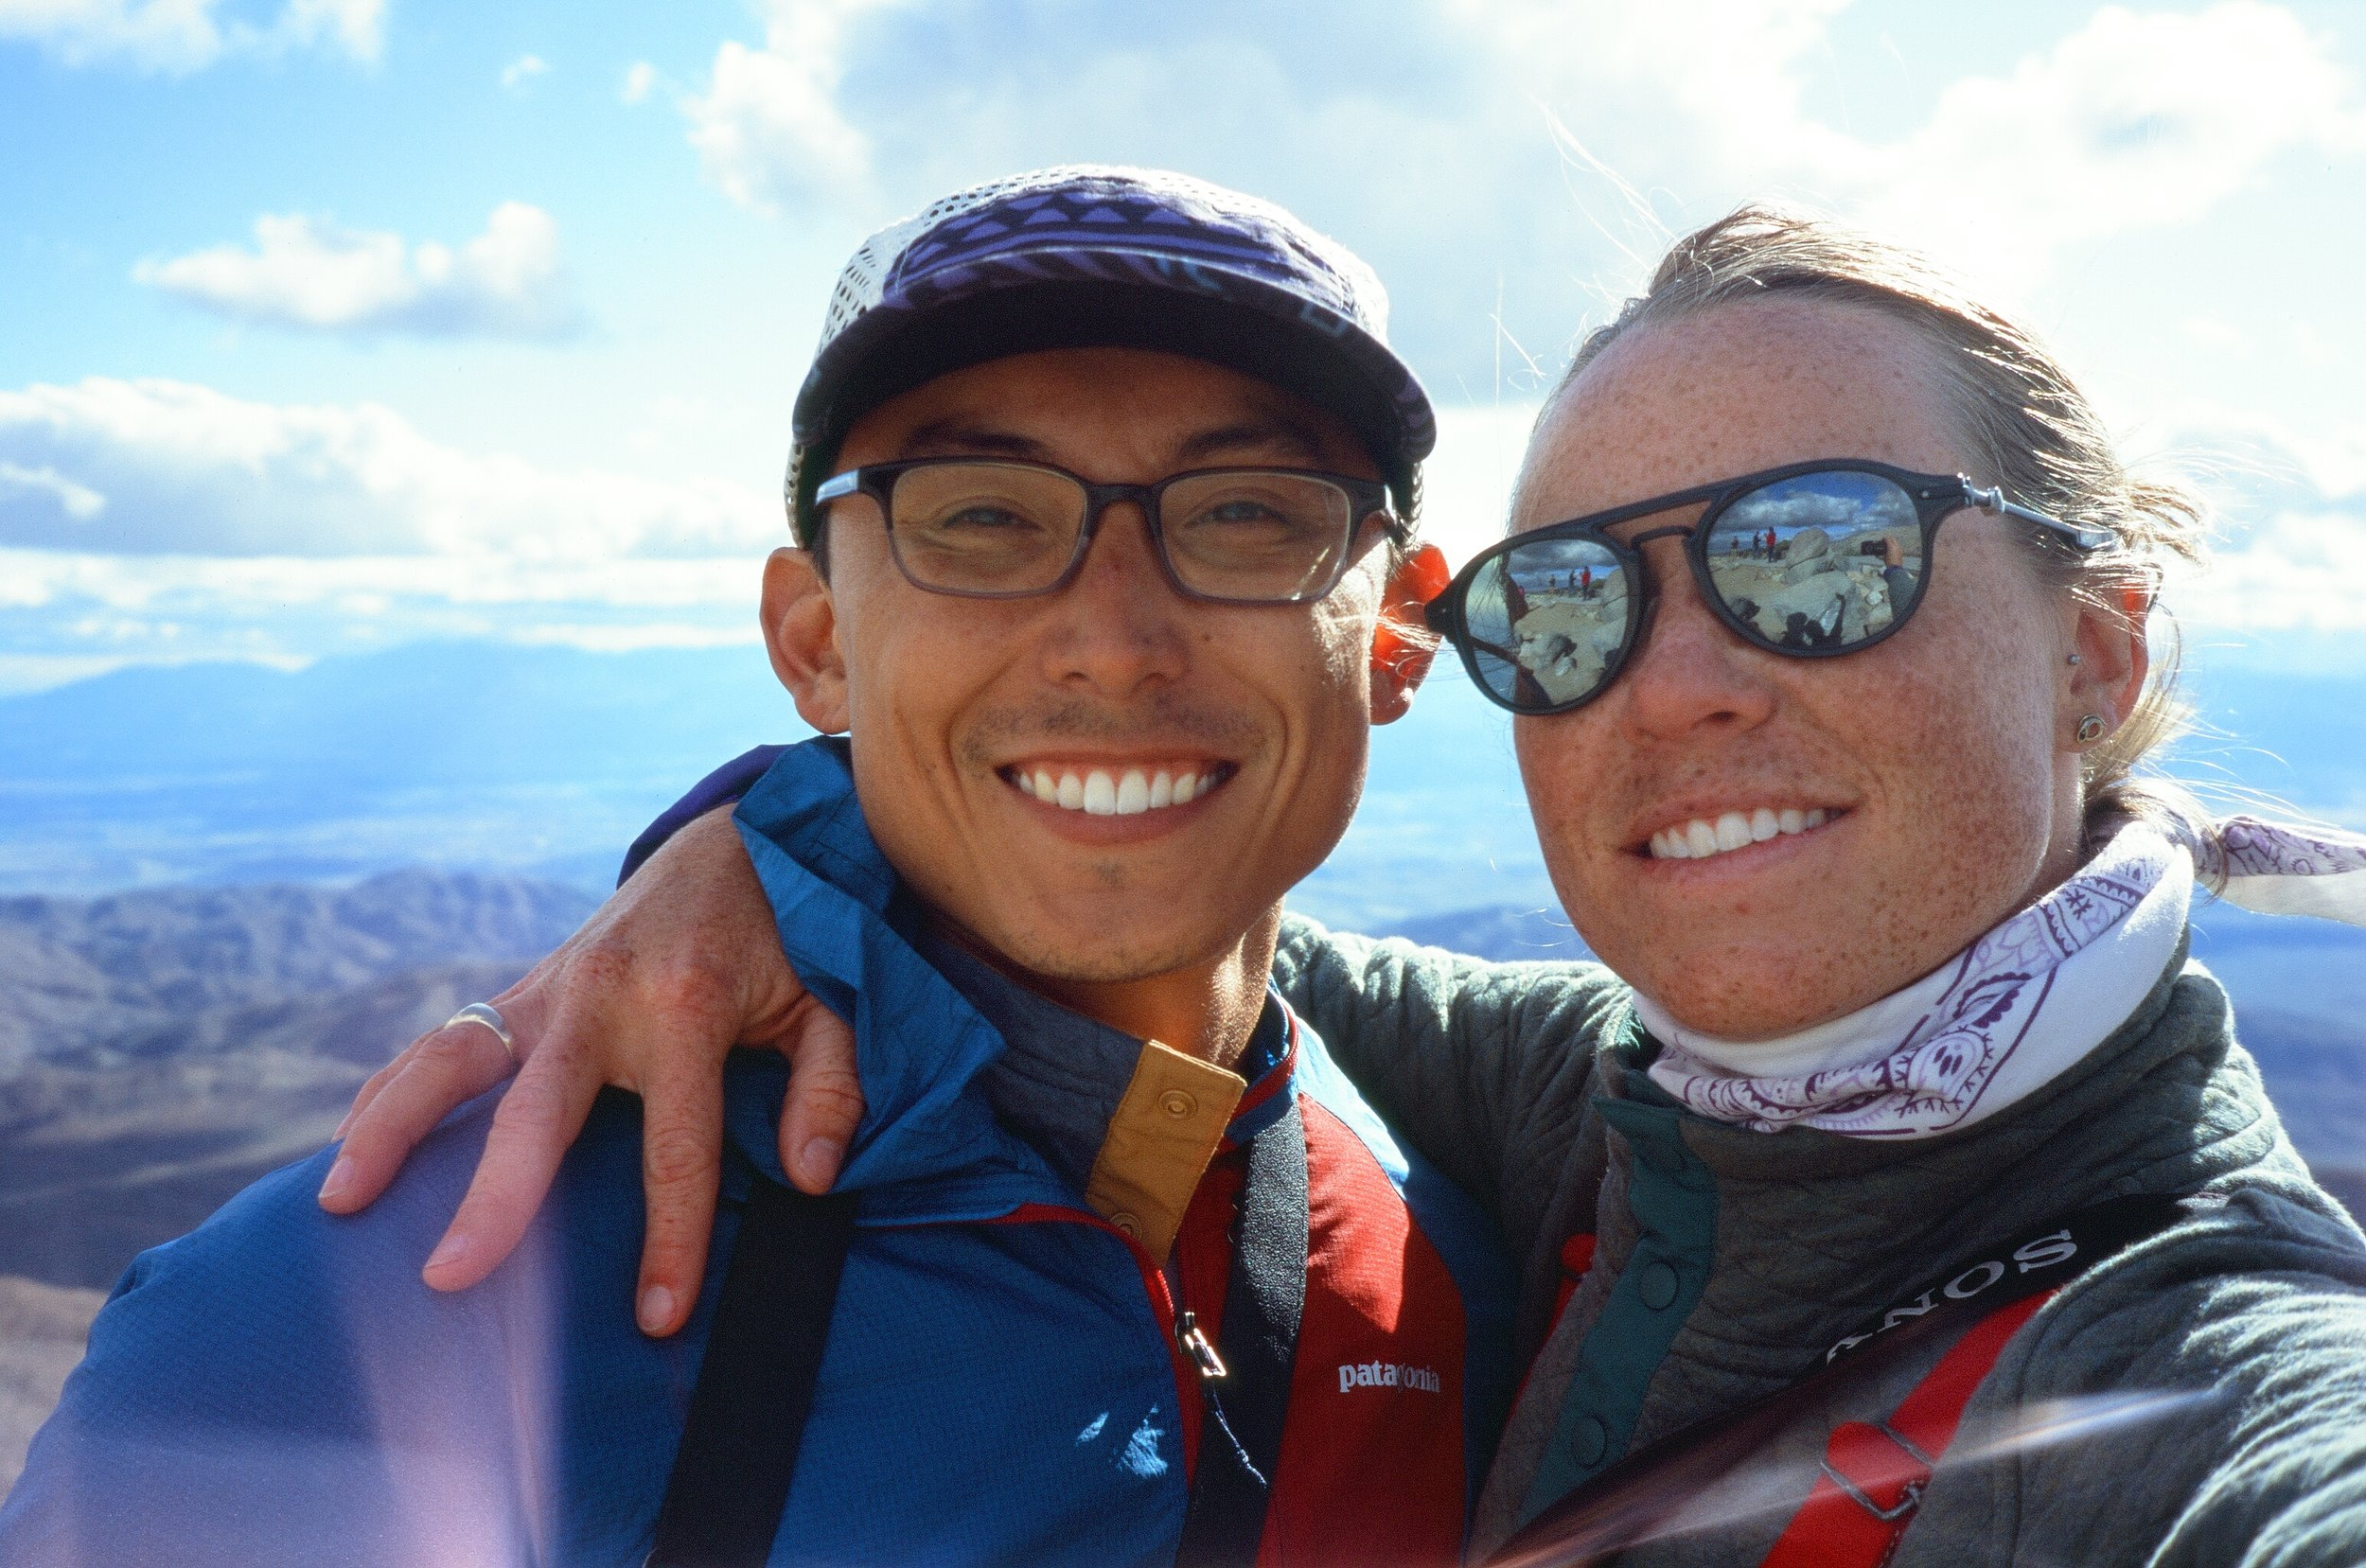 Owen & MAK (film selfie) in Joshua Tree NP, California